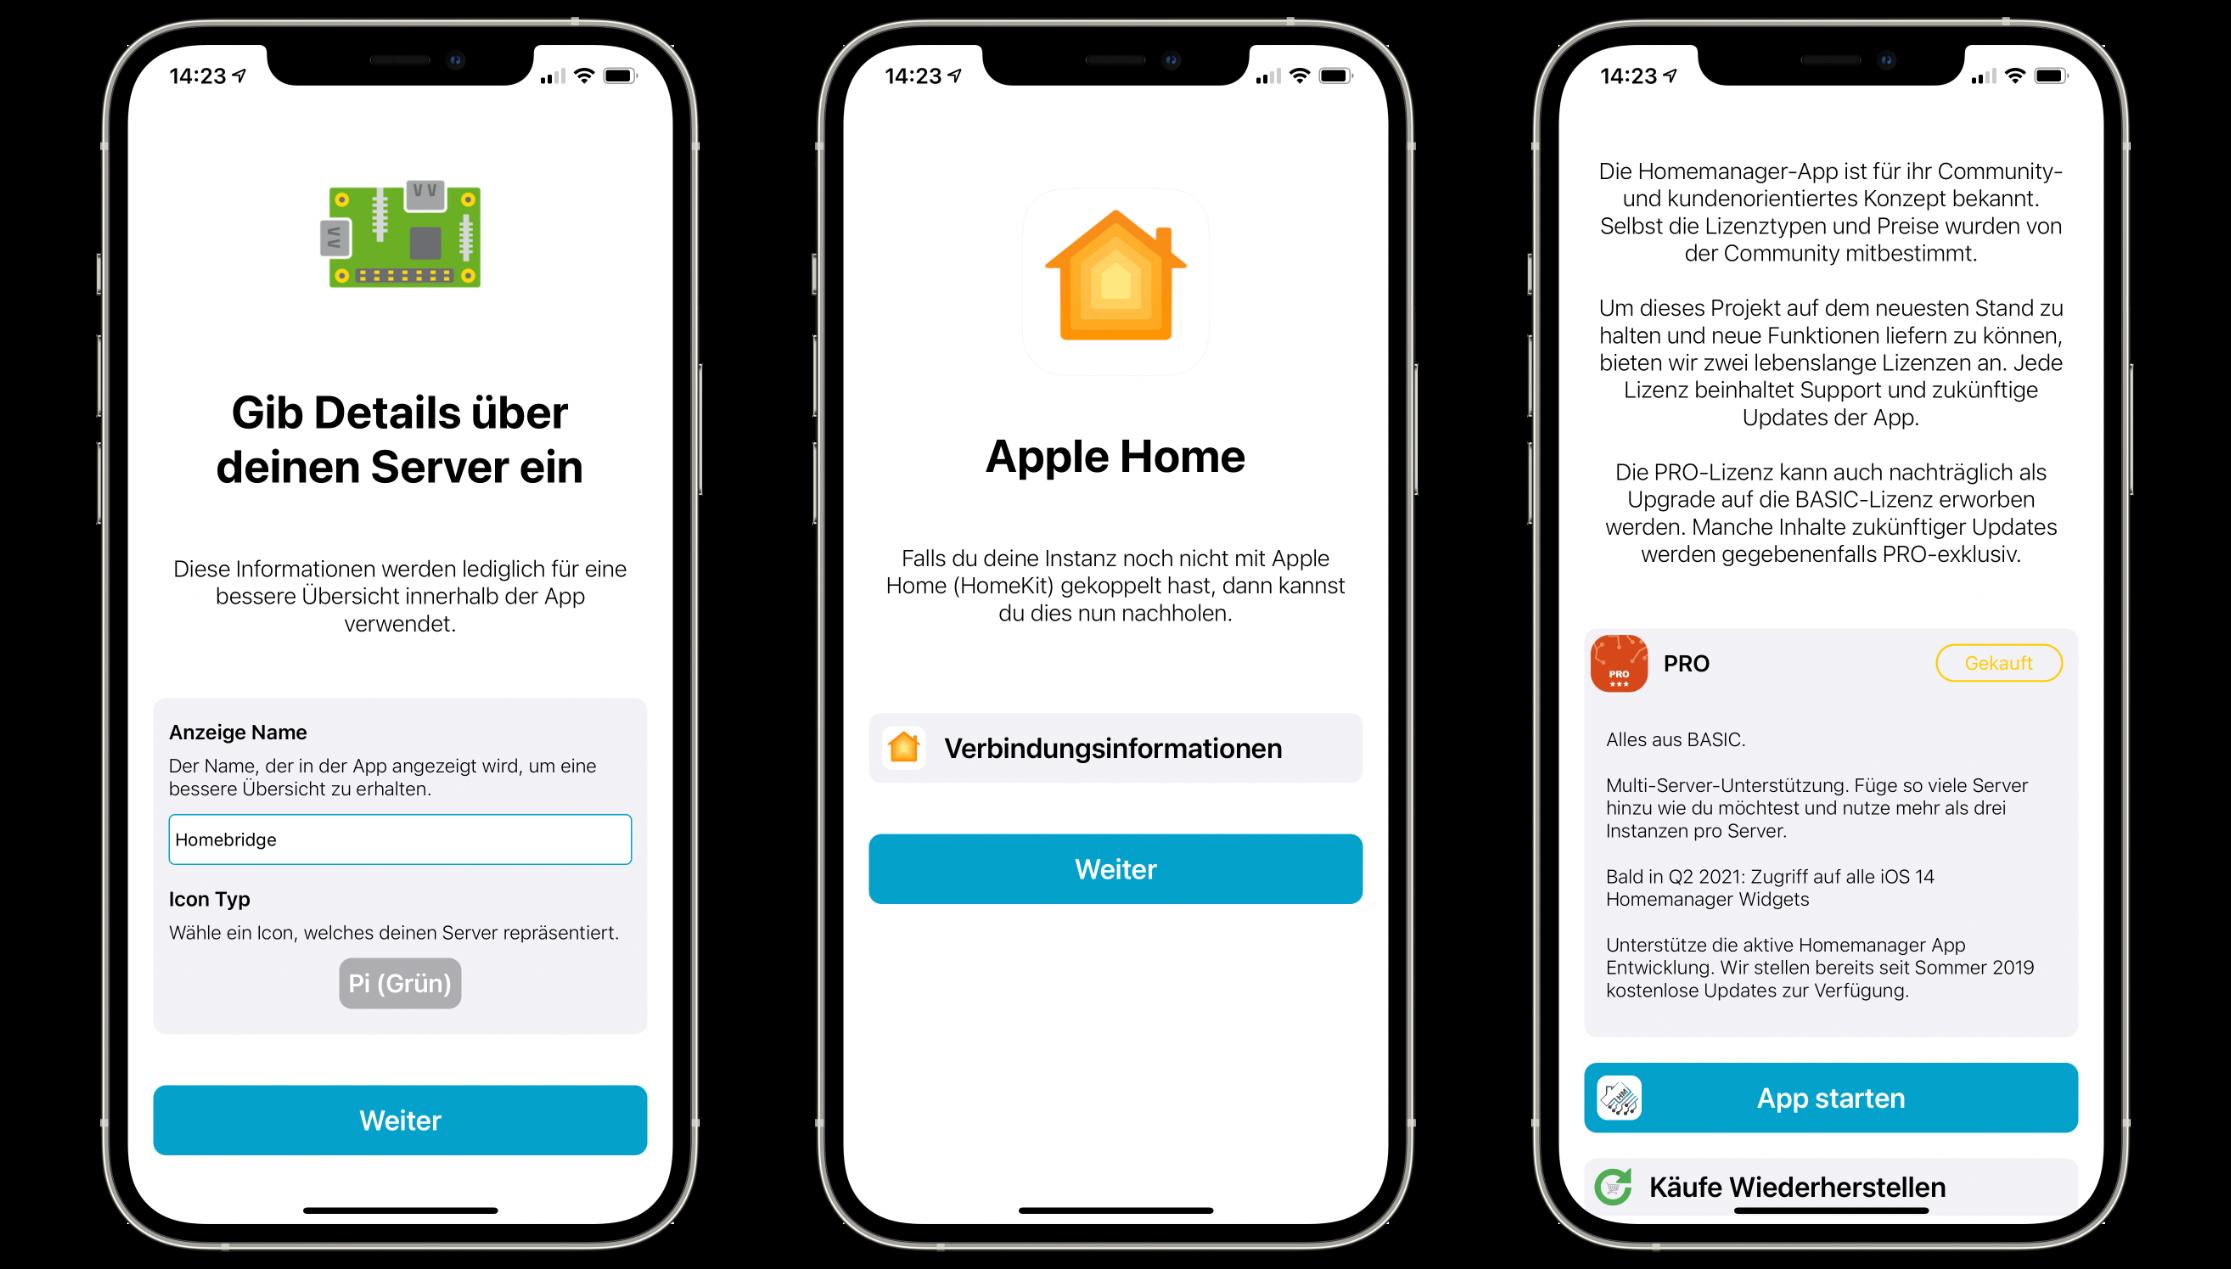 Homemanager-3.0-Homebridge-fuer-Apple-HomeKit-einfach-und-verstaendlich5 Homemanager 3 - Homebridge für Apple HomeKit einfach und verständlich